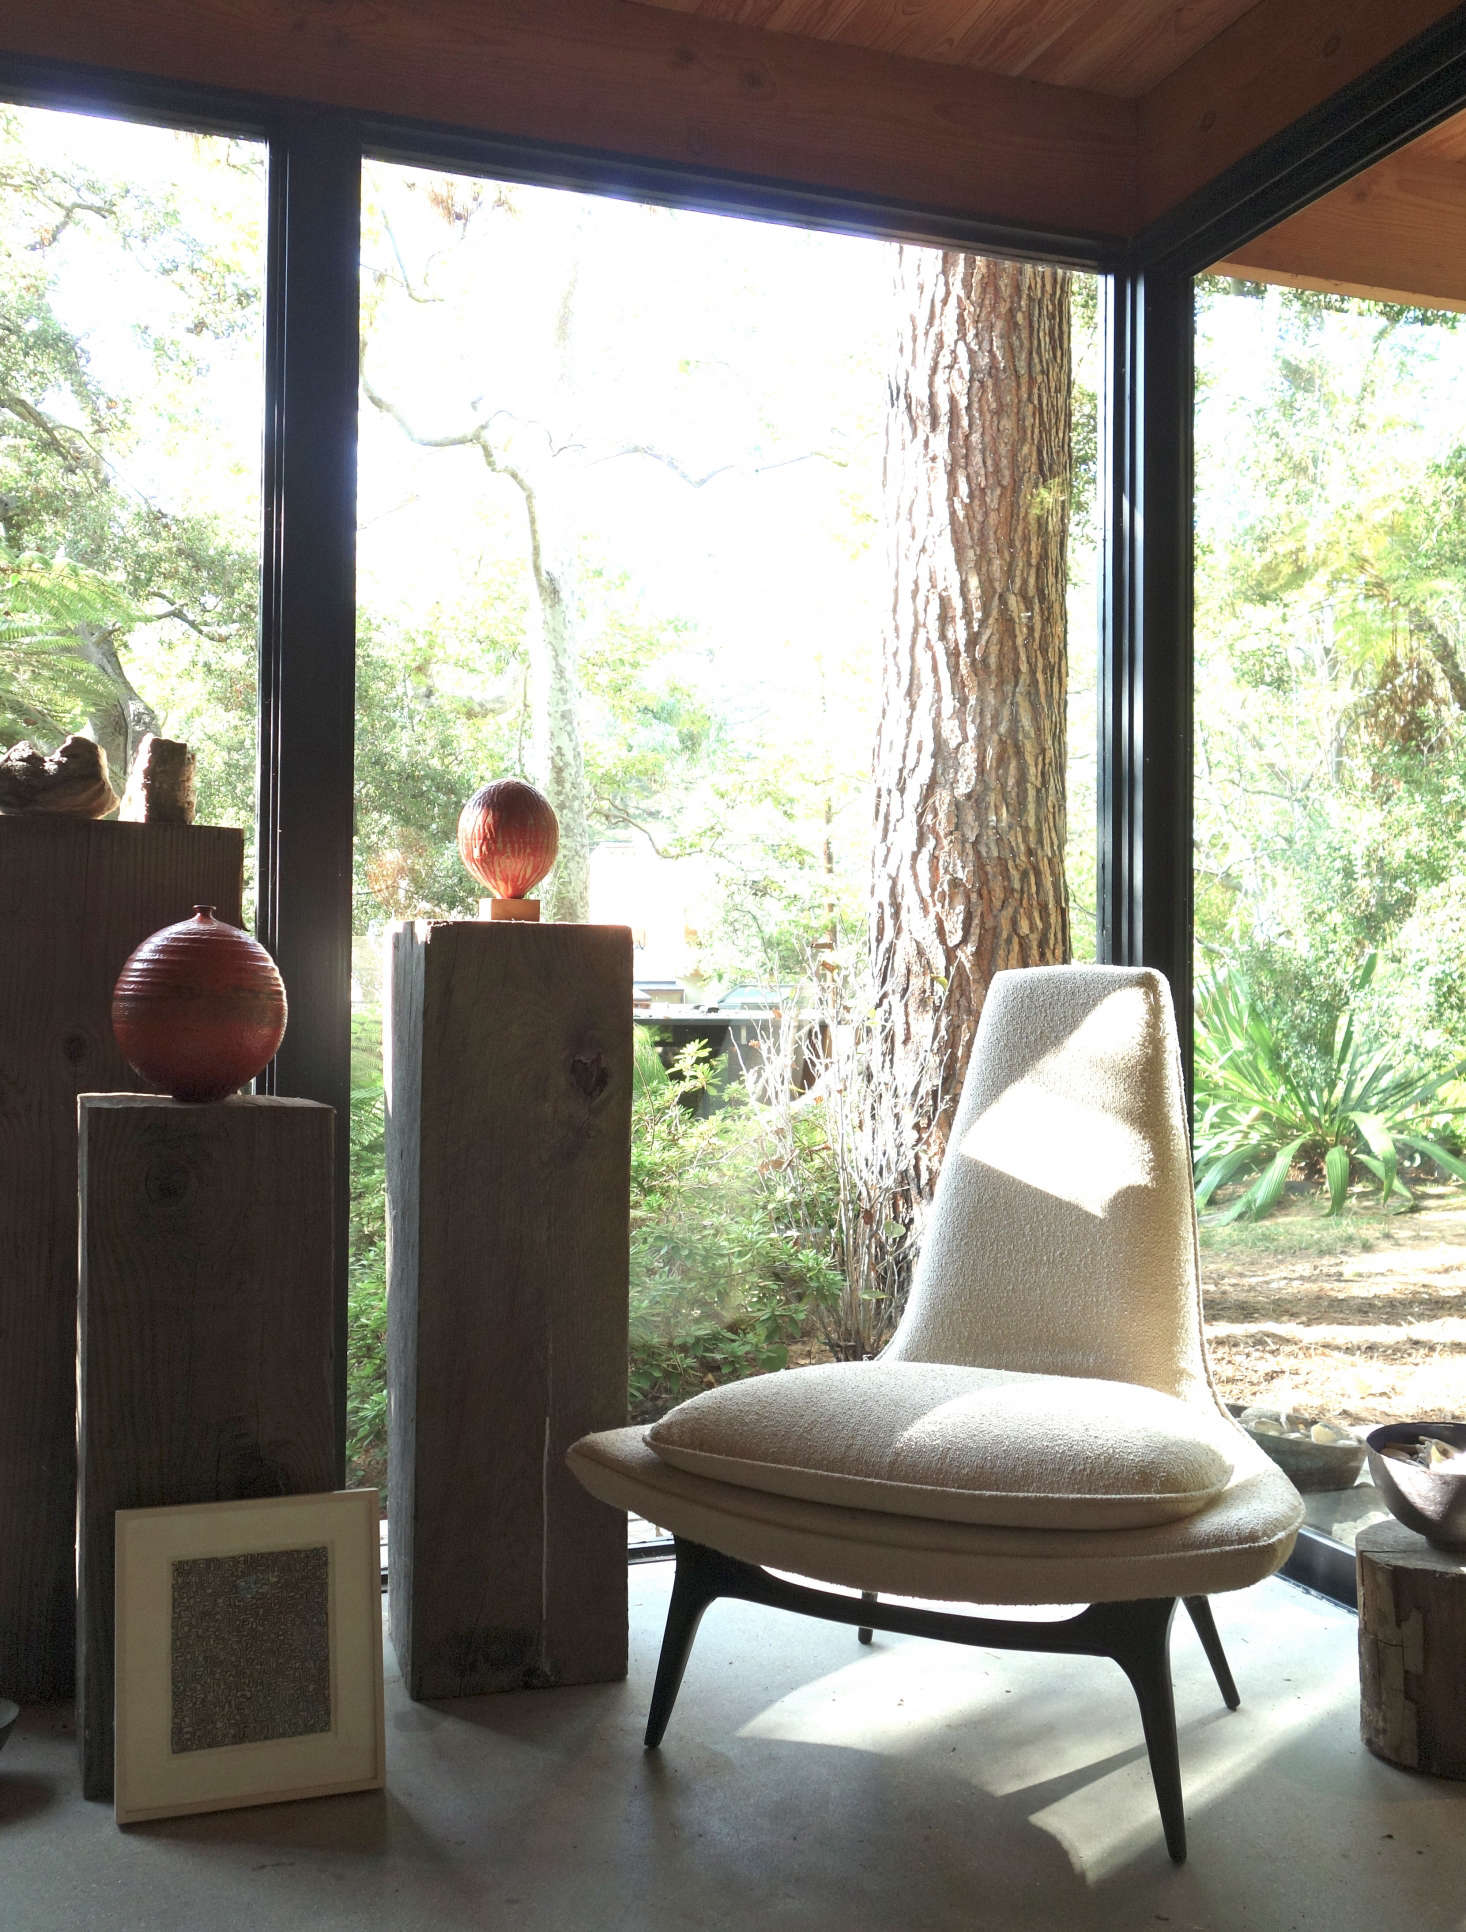 Studio, Santa Monica: A vintage Karpen chair, oak pedestals, and ceramics fill the corner. Photo: Laura Clayton Baker